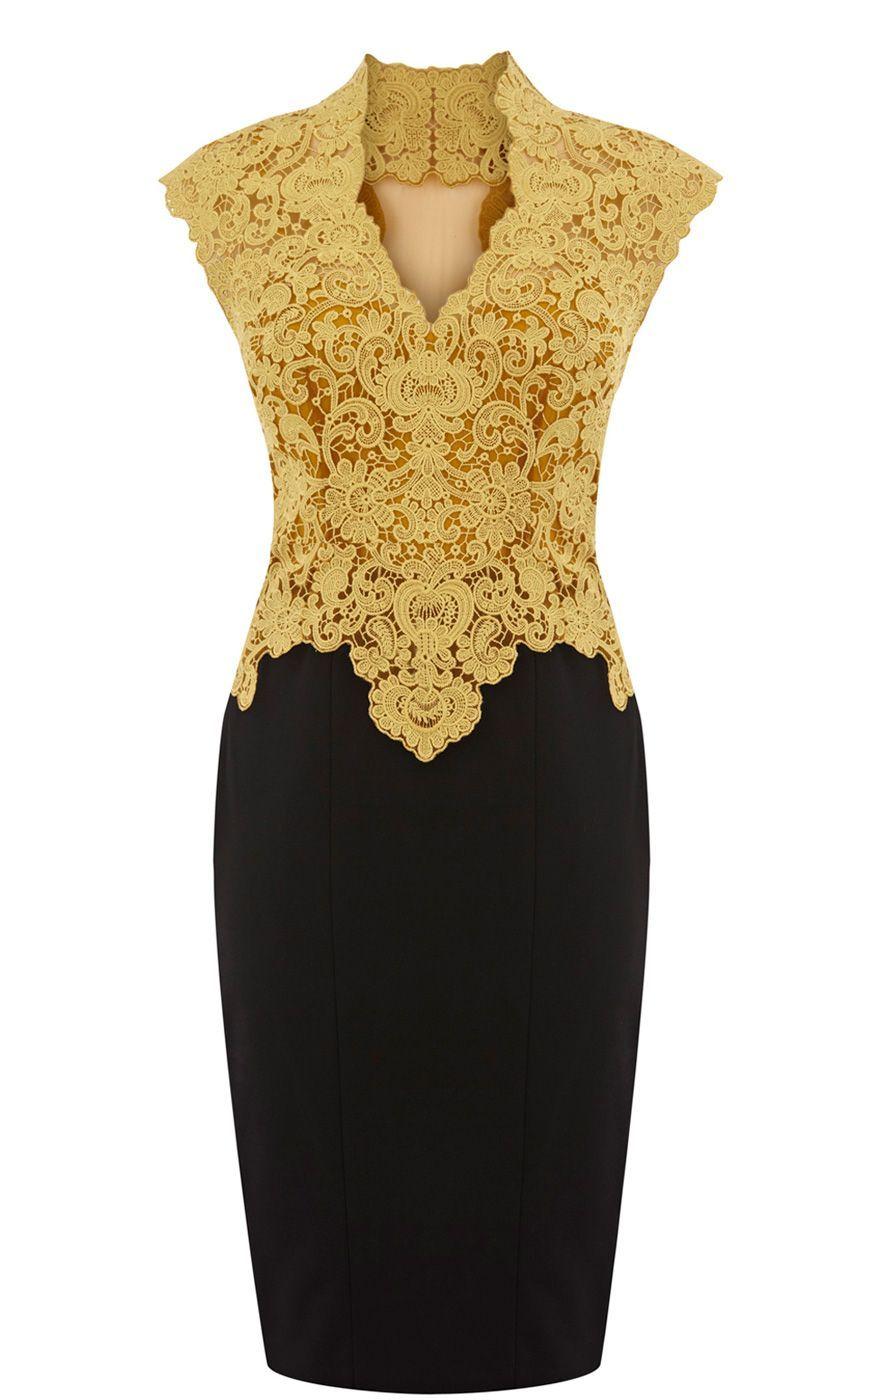 Karen millen heavy cotton lace dress in black dresses